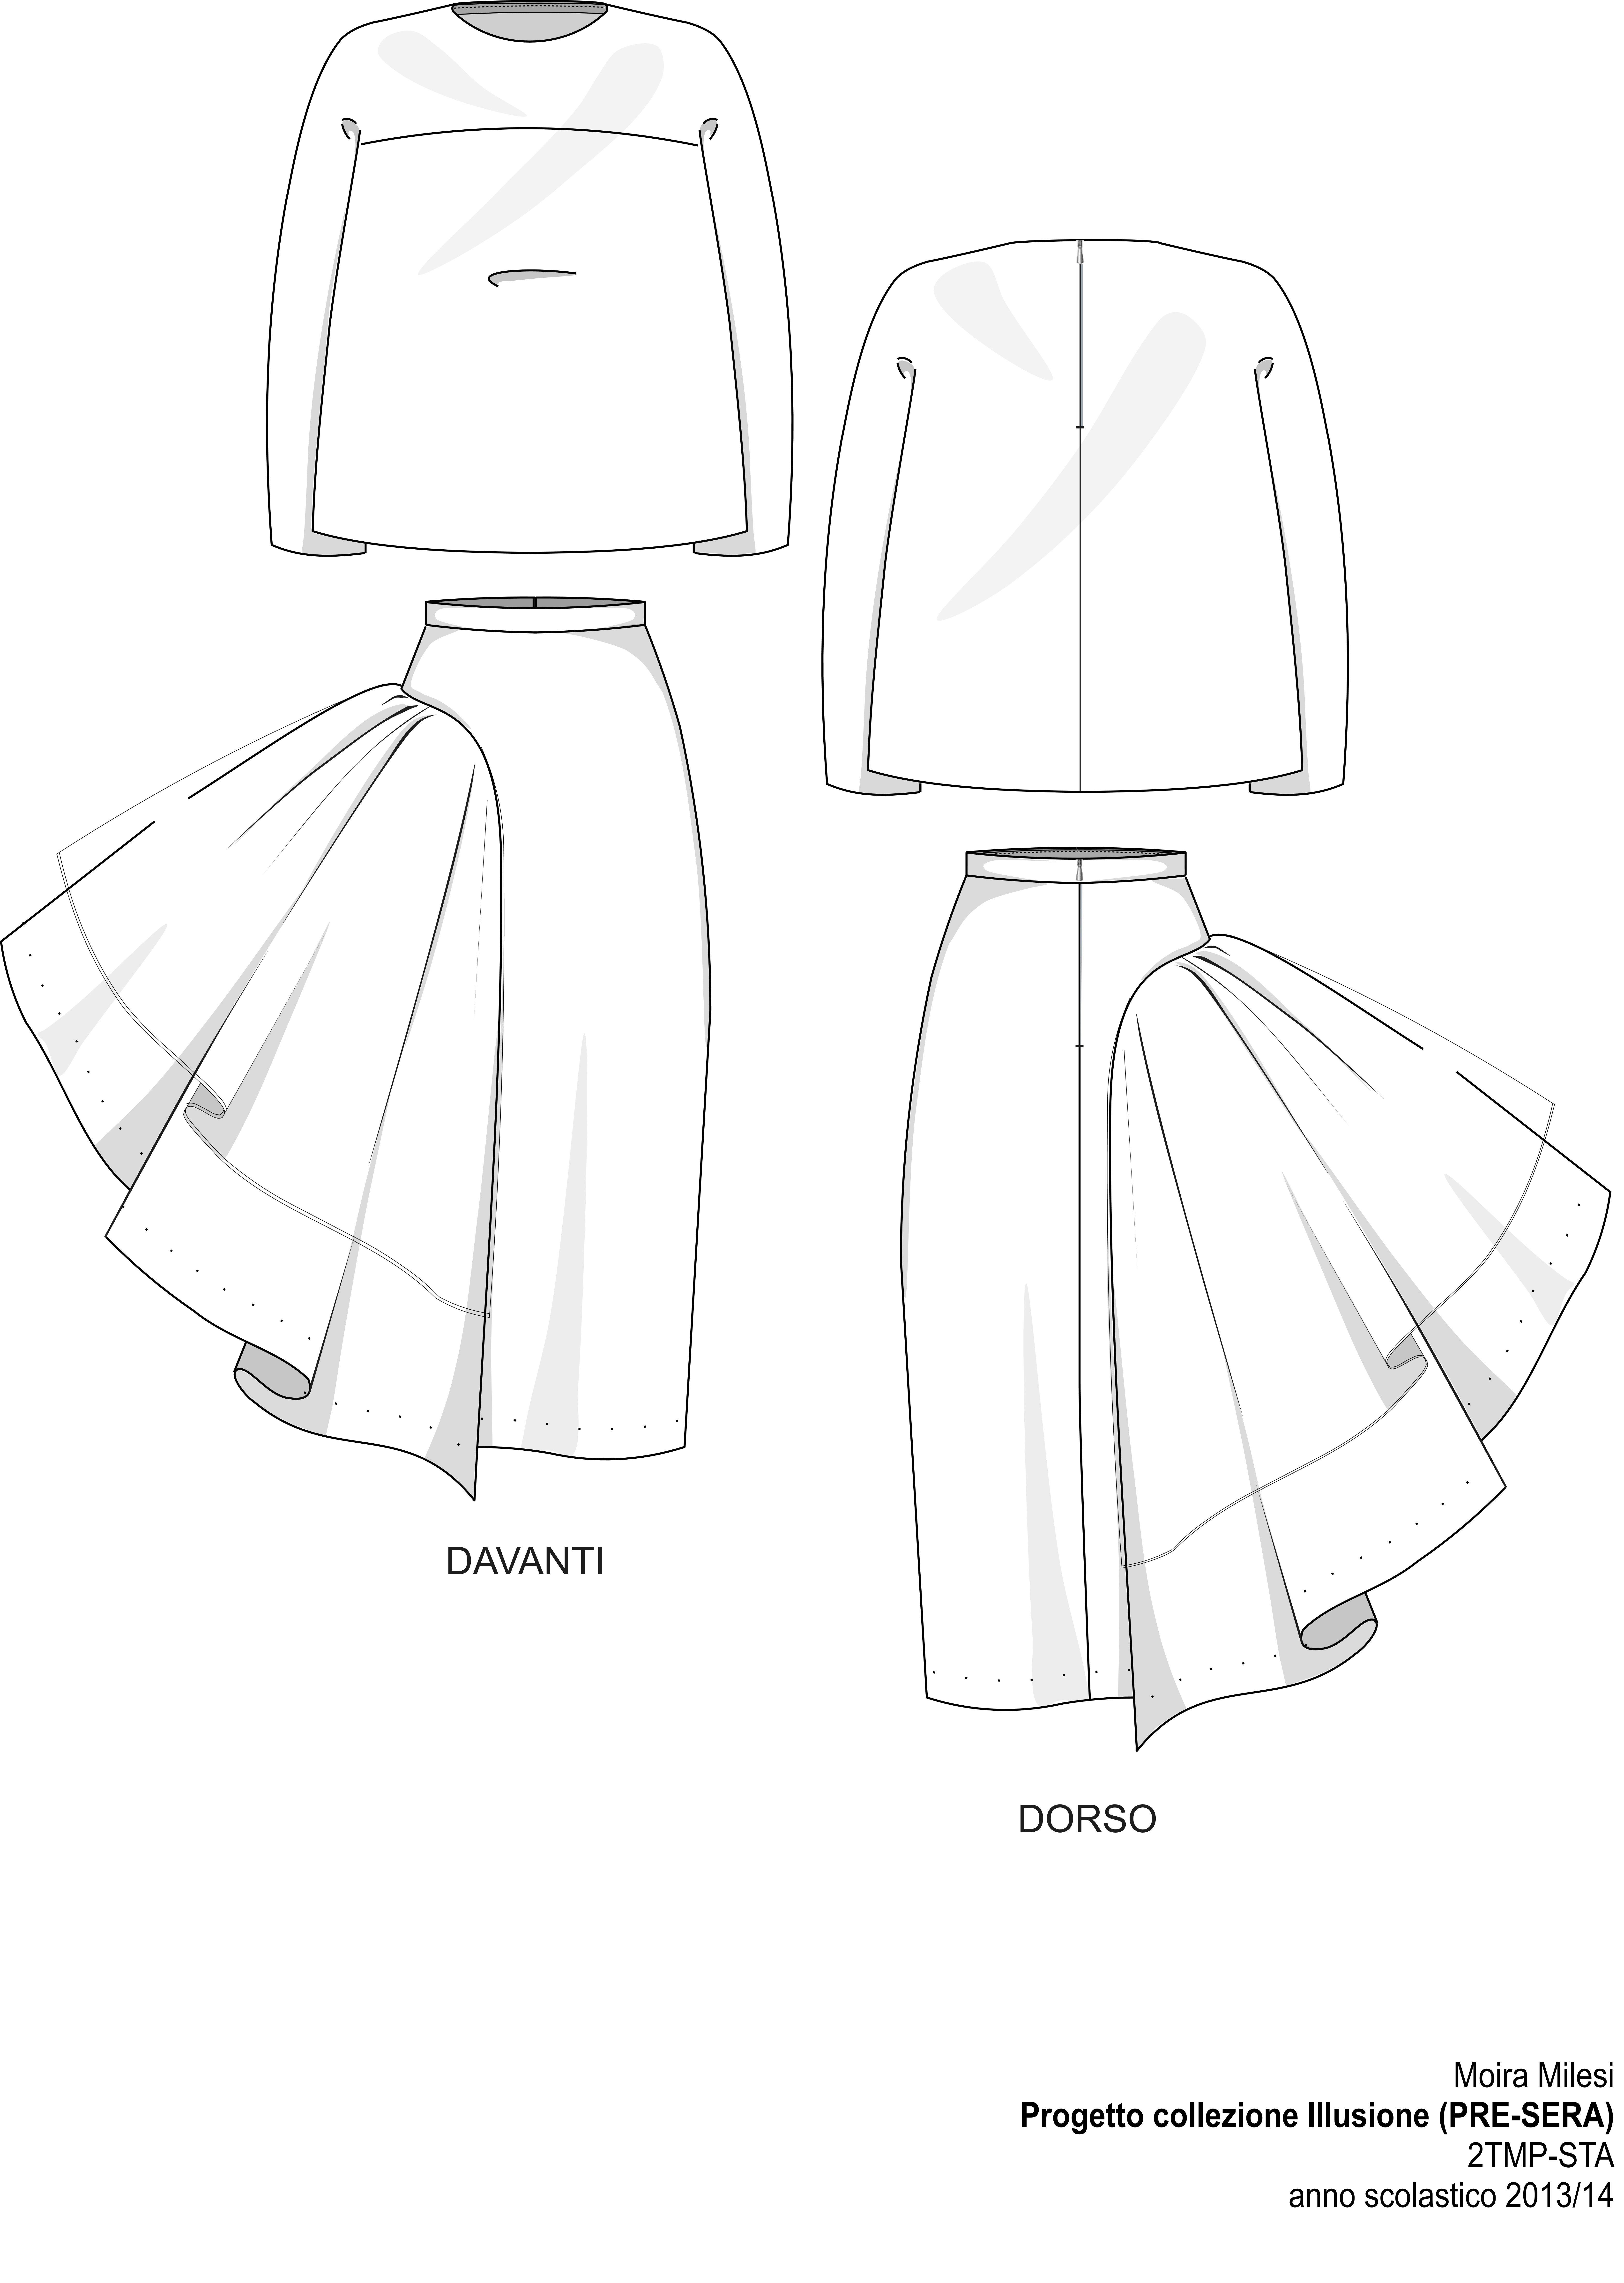 6714x9438 Weirdly Interesting Technical Sheet 5. Evening Fashion Show Sta